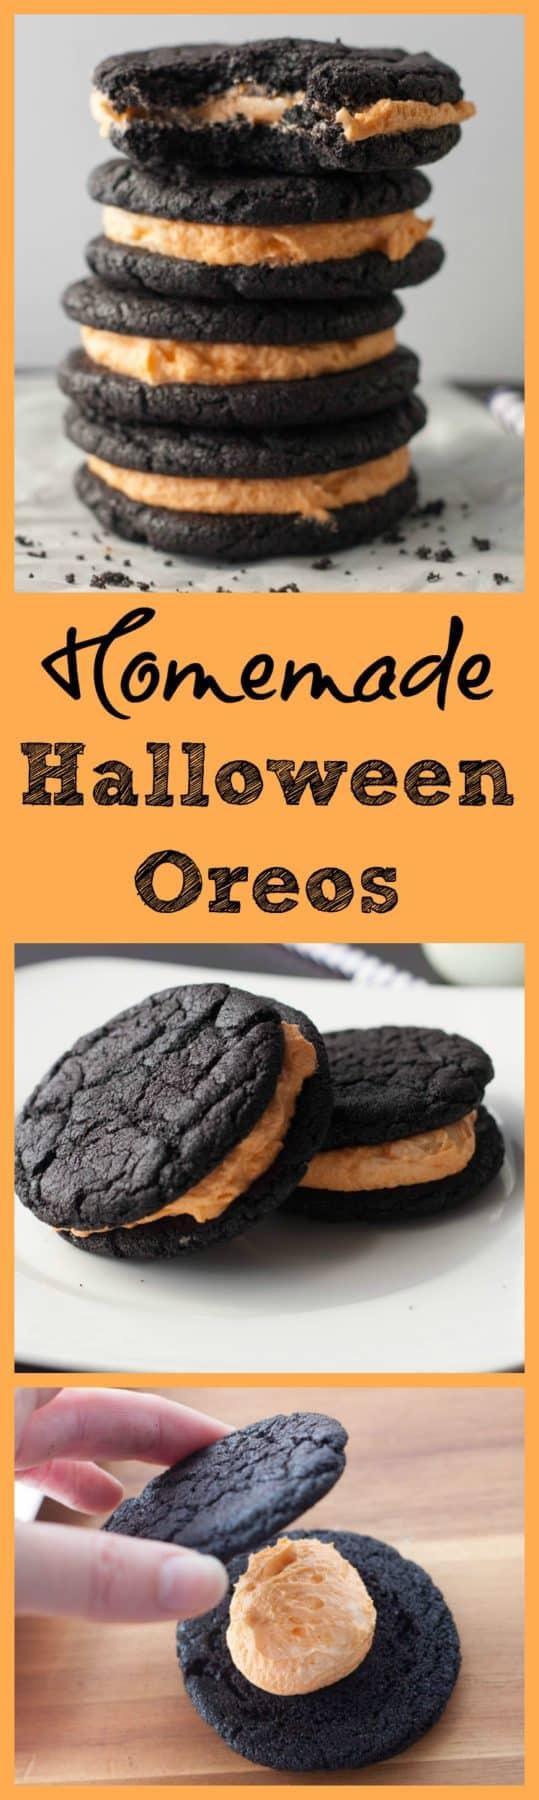 Halloween Homemade Oreo Cookie Recipe - Boston Girl Bakes